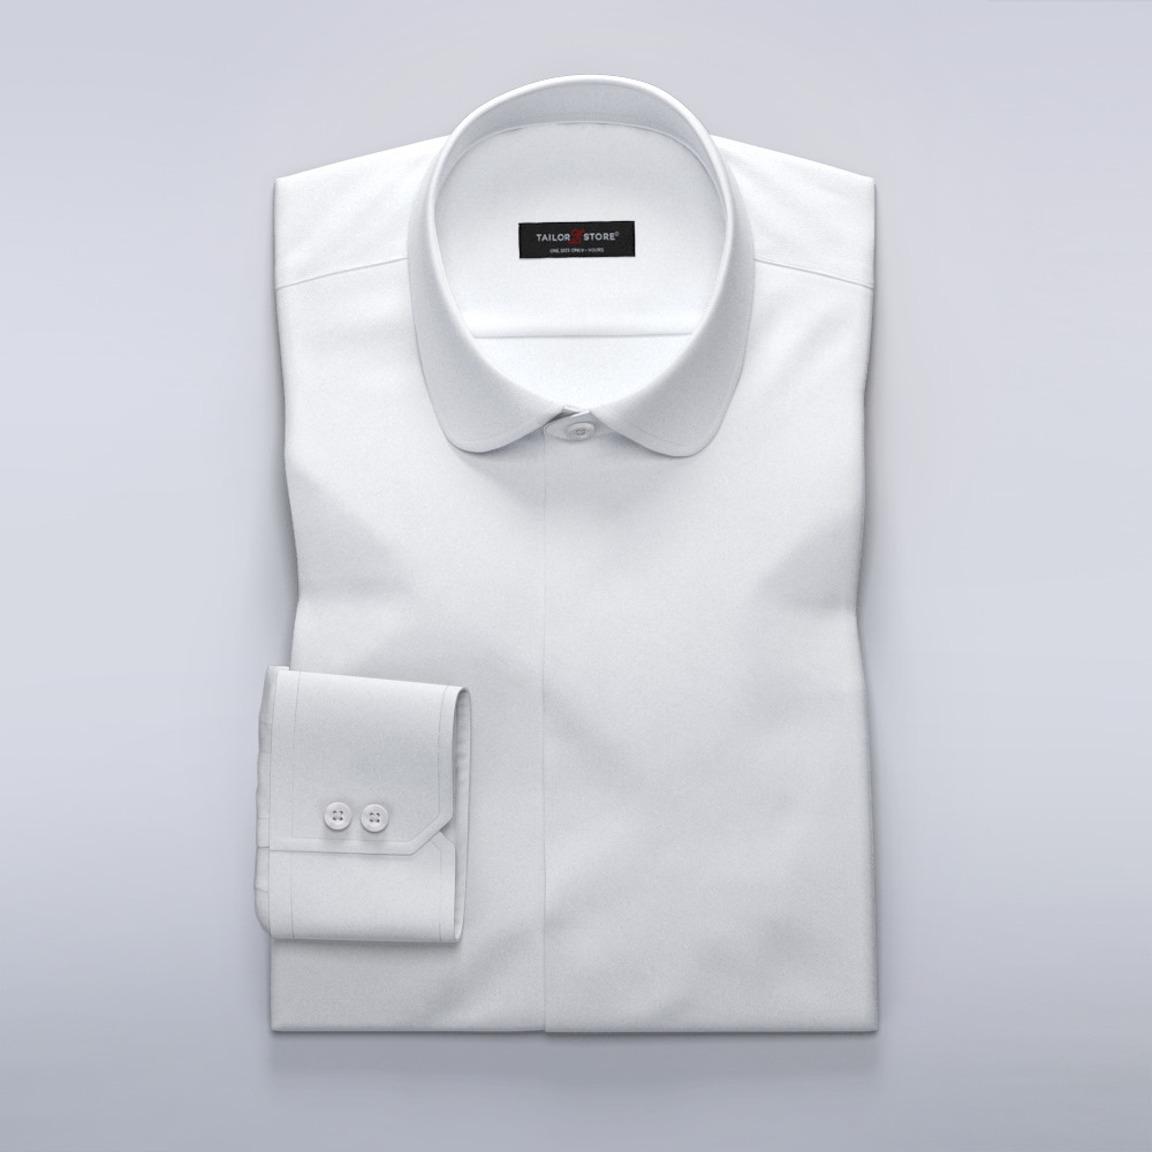 Damskjorta i exklusiv vit herringbone